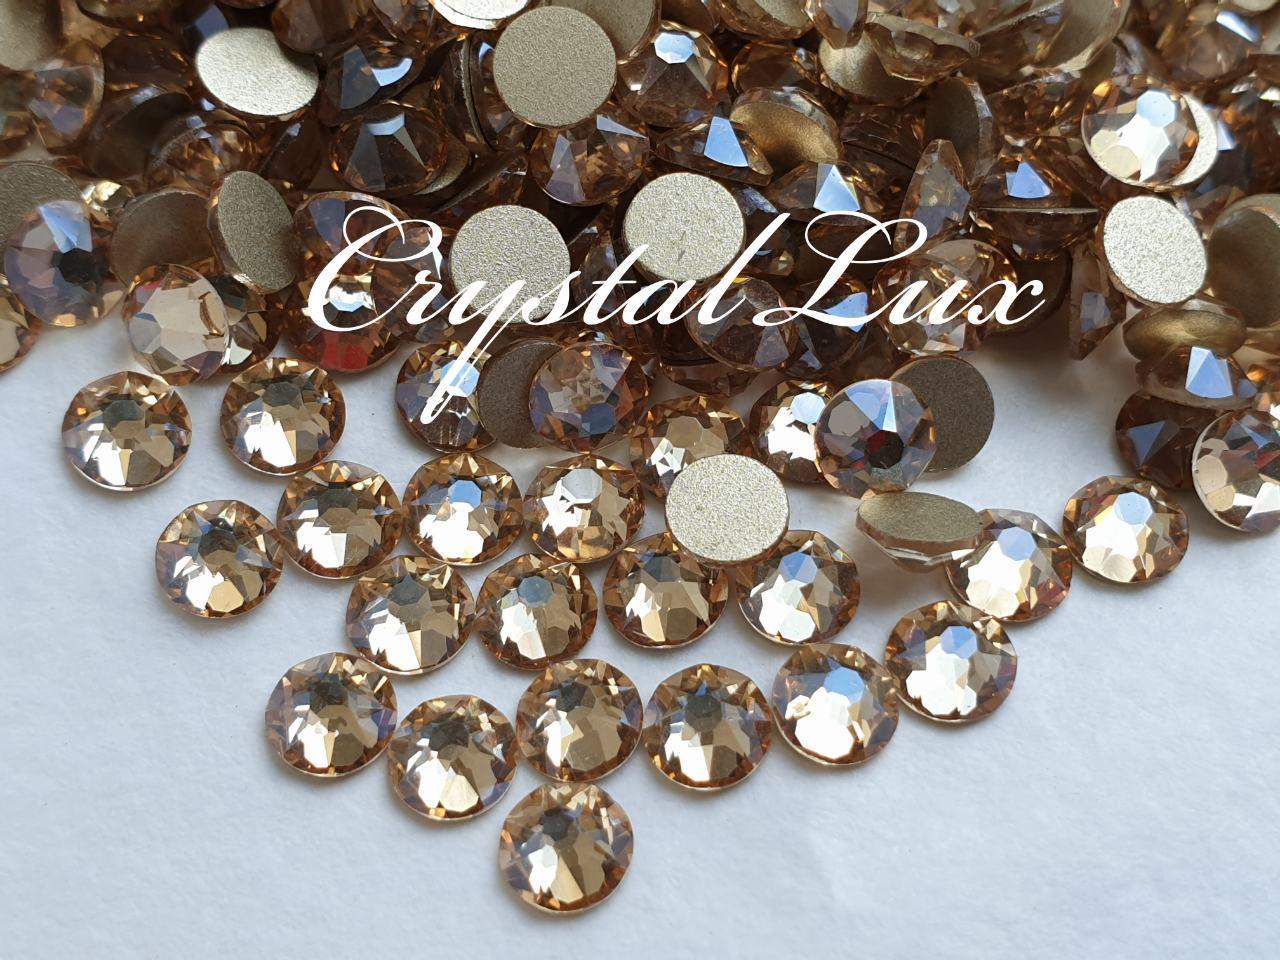 Стразы ss20 Gold Shaddow Xirius, NEW, 16 граней, 100шт. (5,0мм)